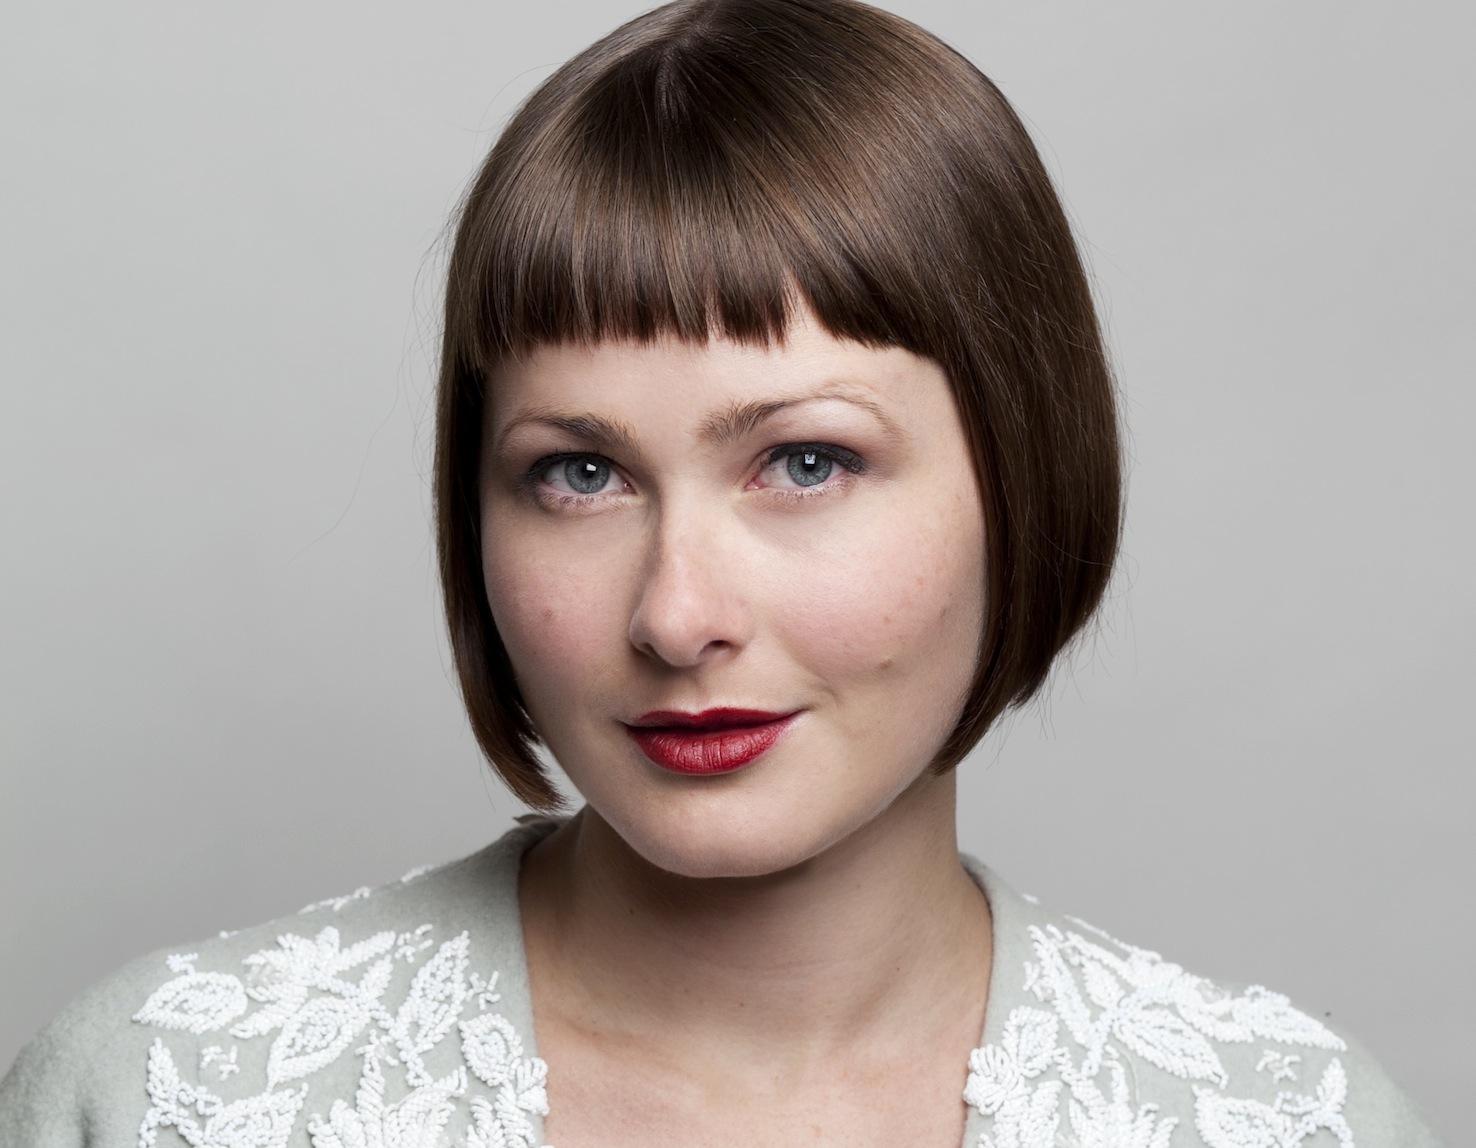 Head shot copyright Lucia Ondrusova 2012